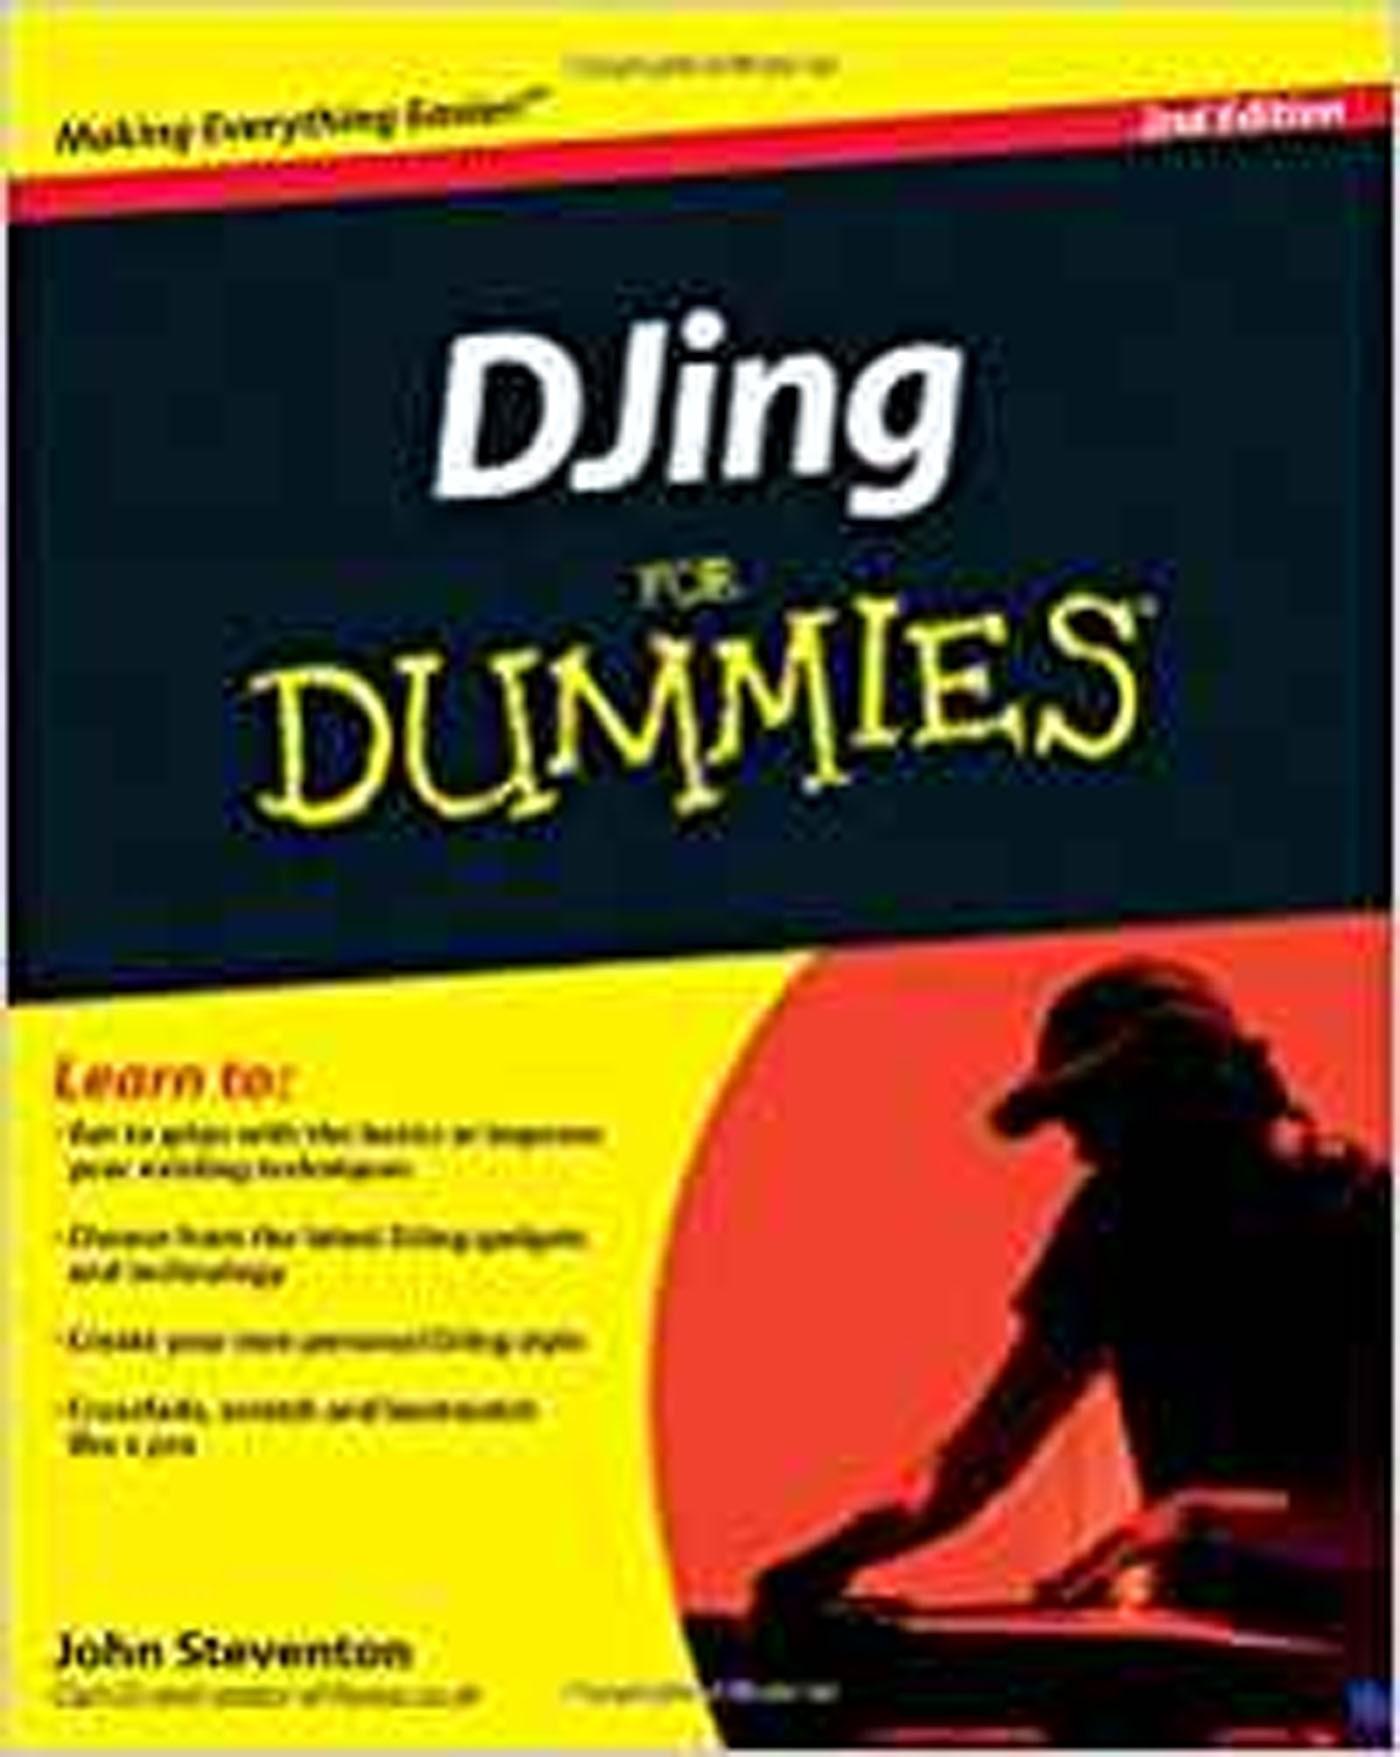 DJing For Dummies Book 2nd Edition John Steventon DJ Techniques S168